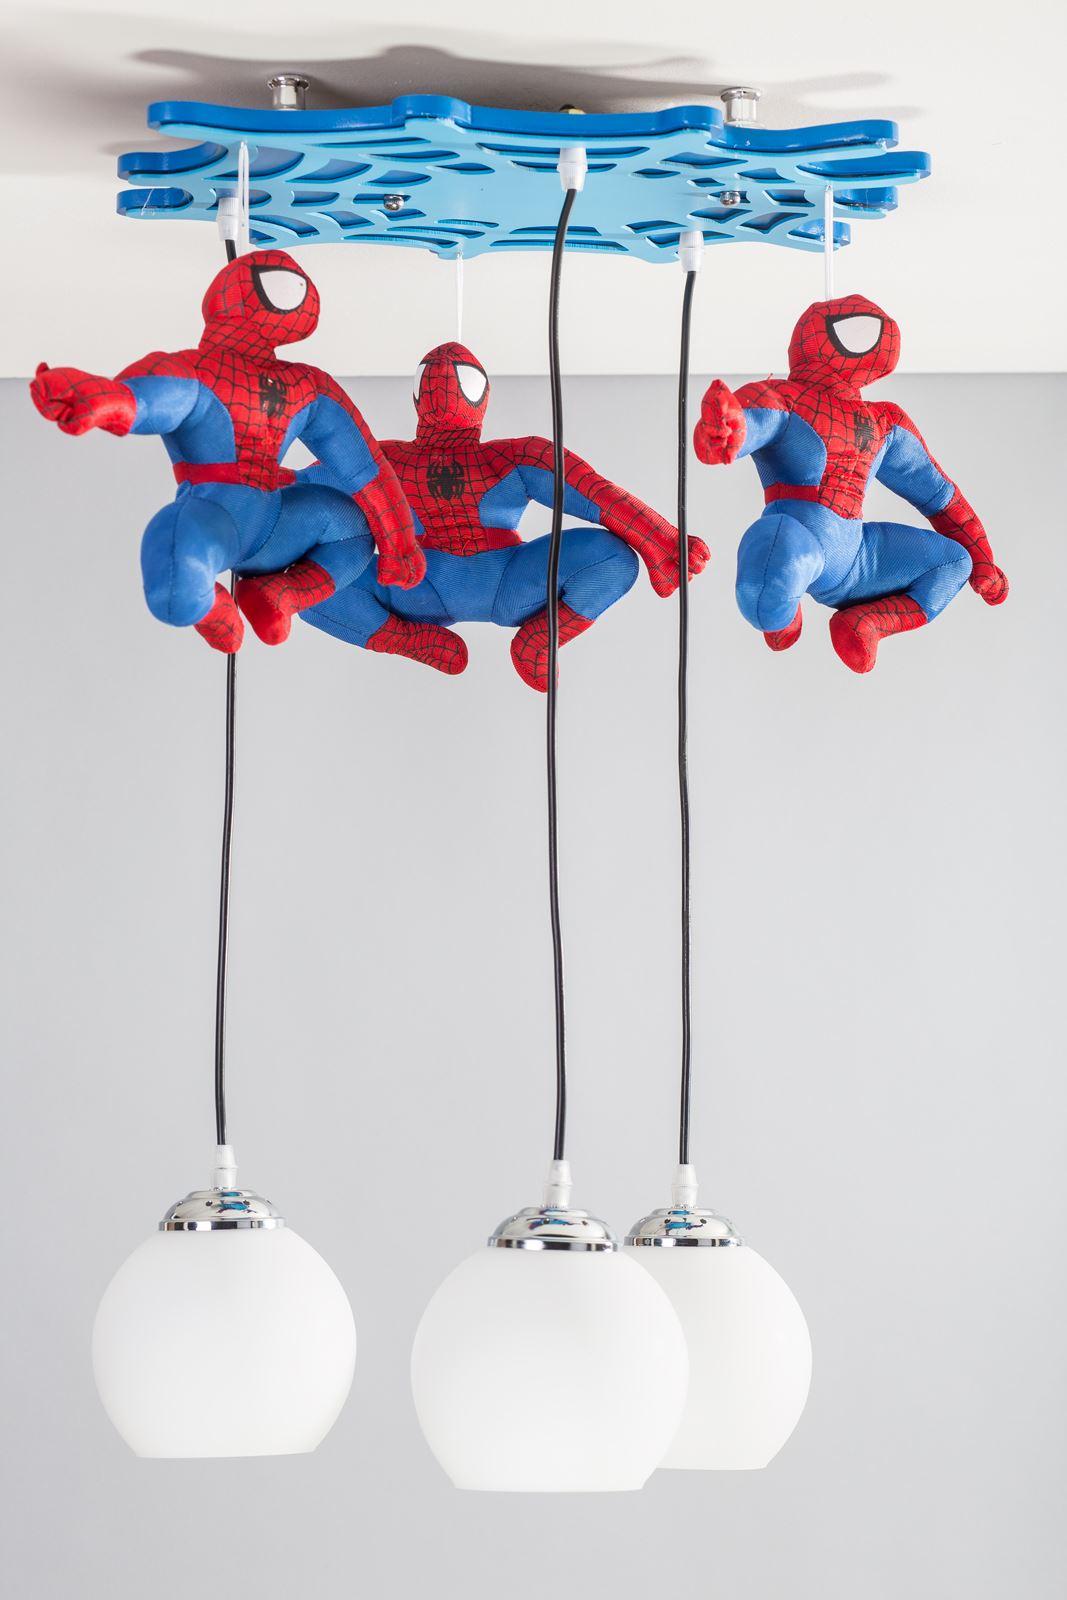 spiderman modern lights bedroom boys and girls ceiling